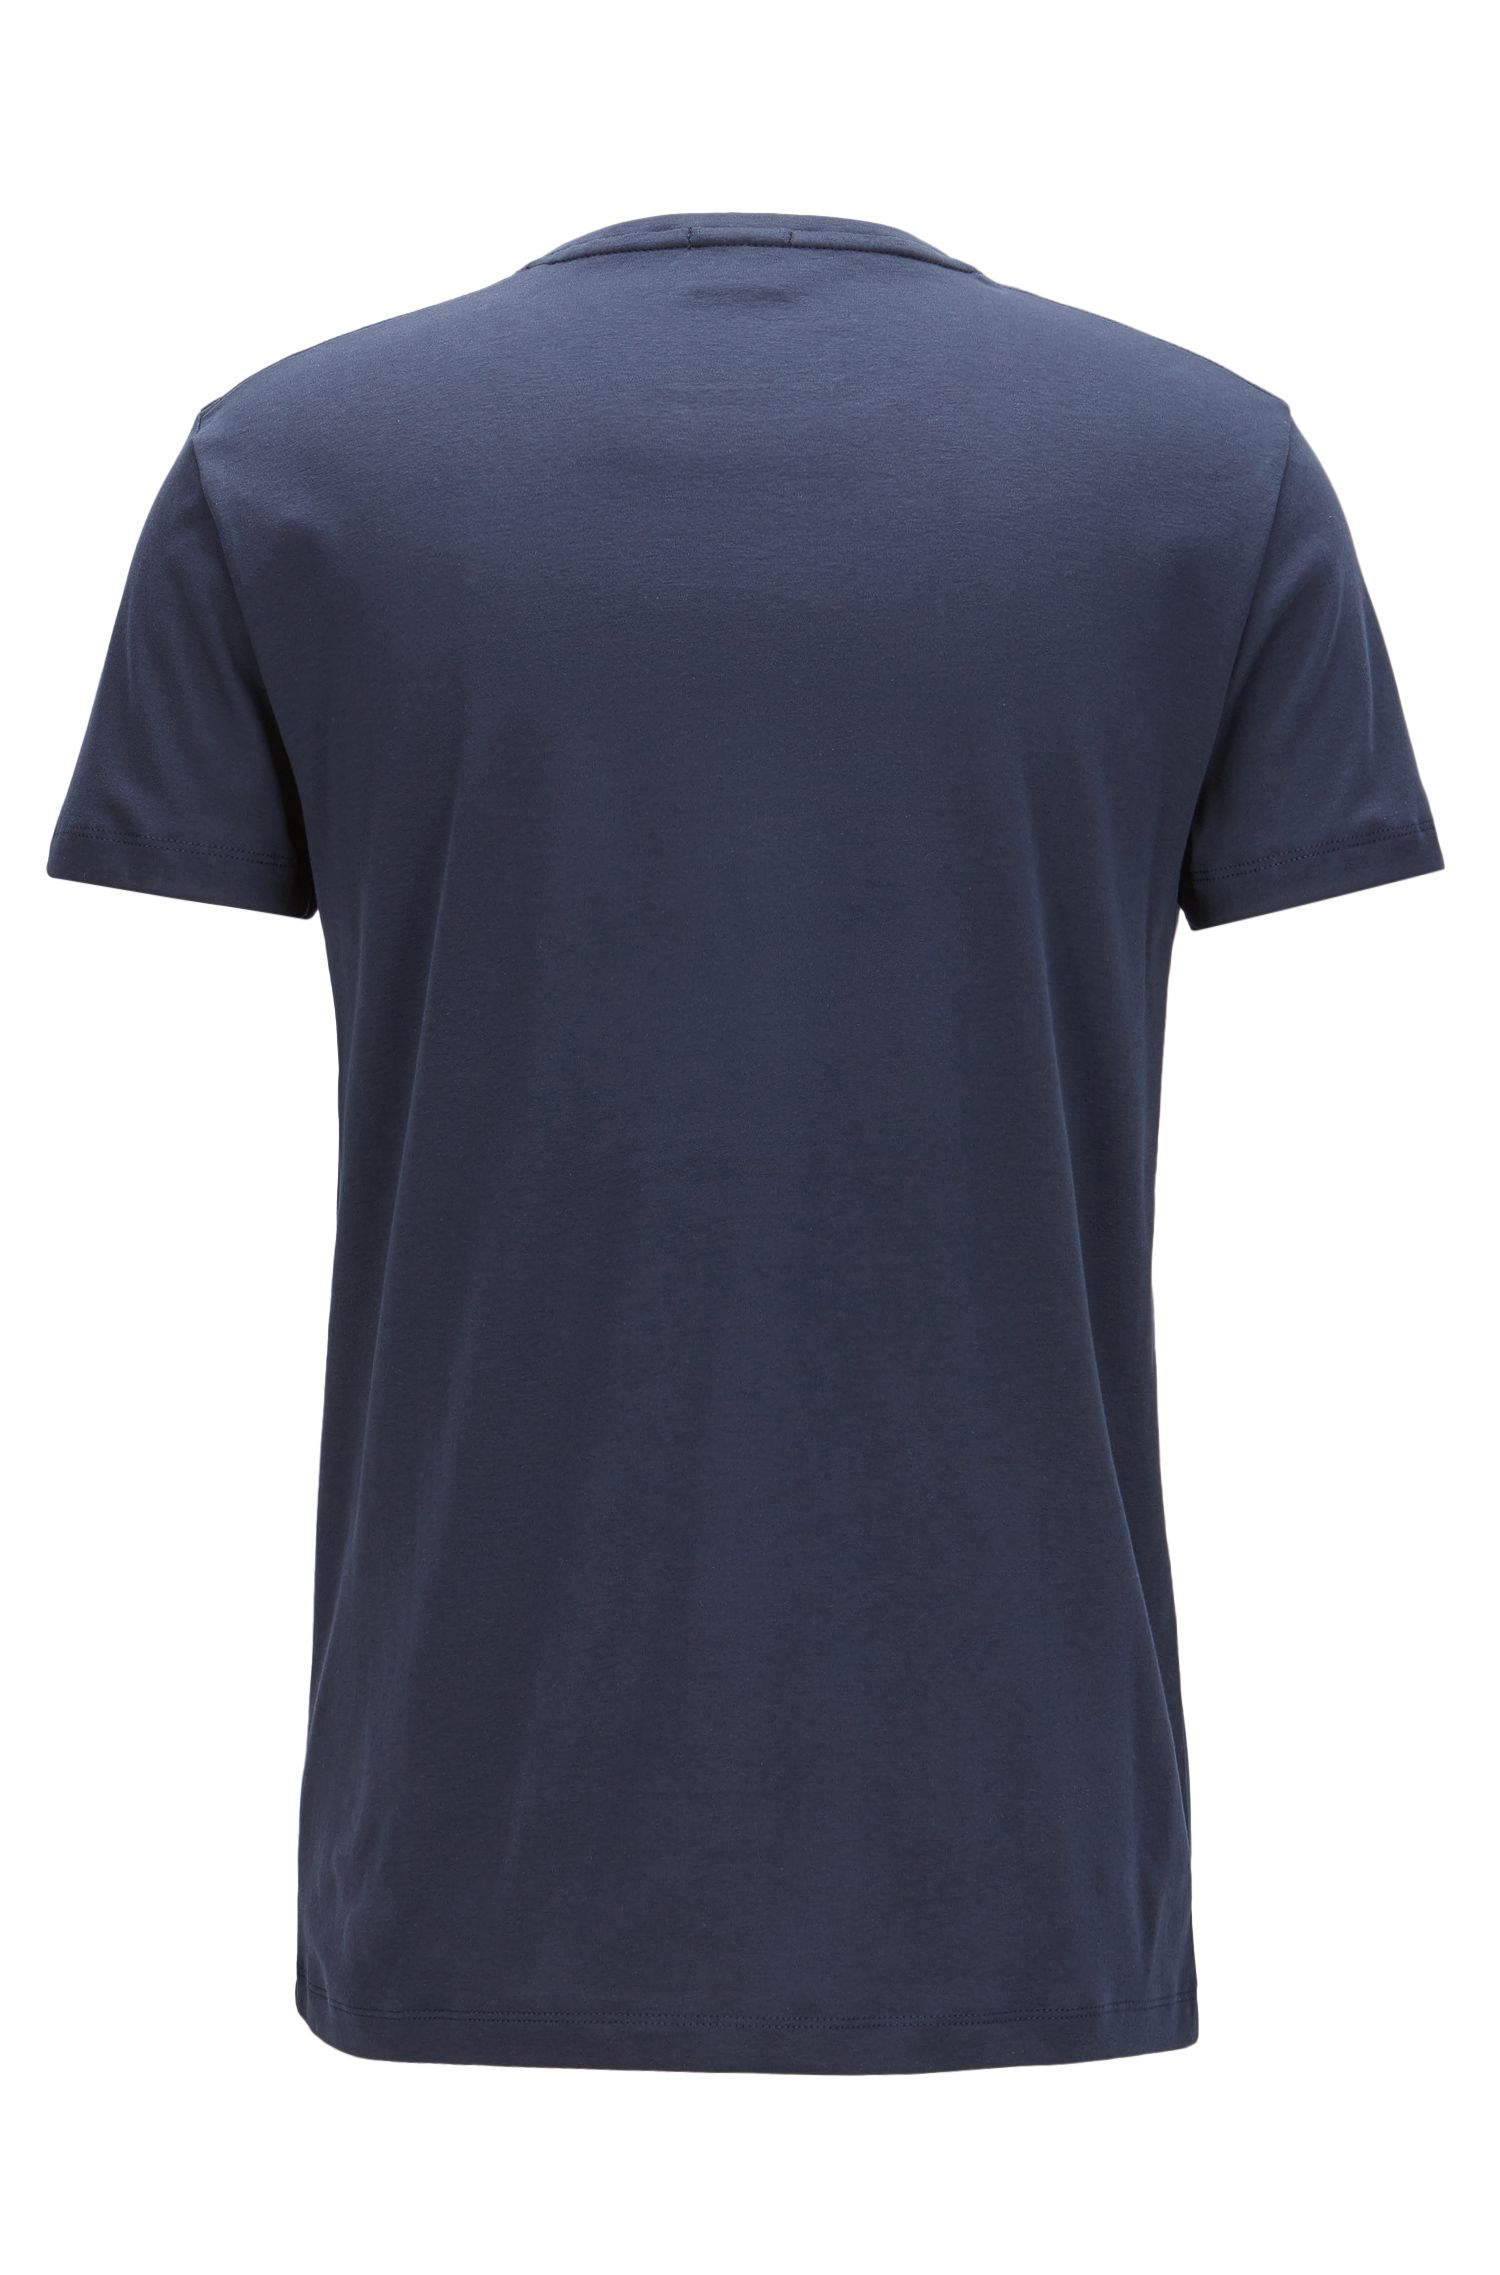 Logo-Print Graphic T-Shirt   Tessler